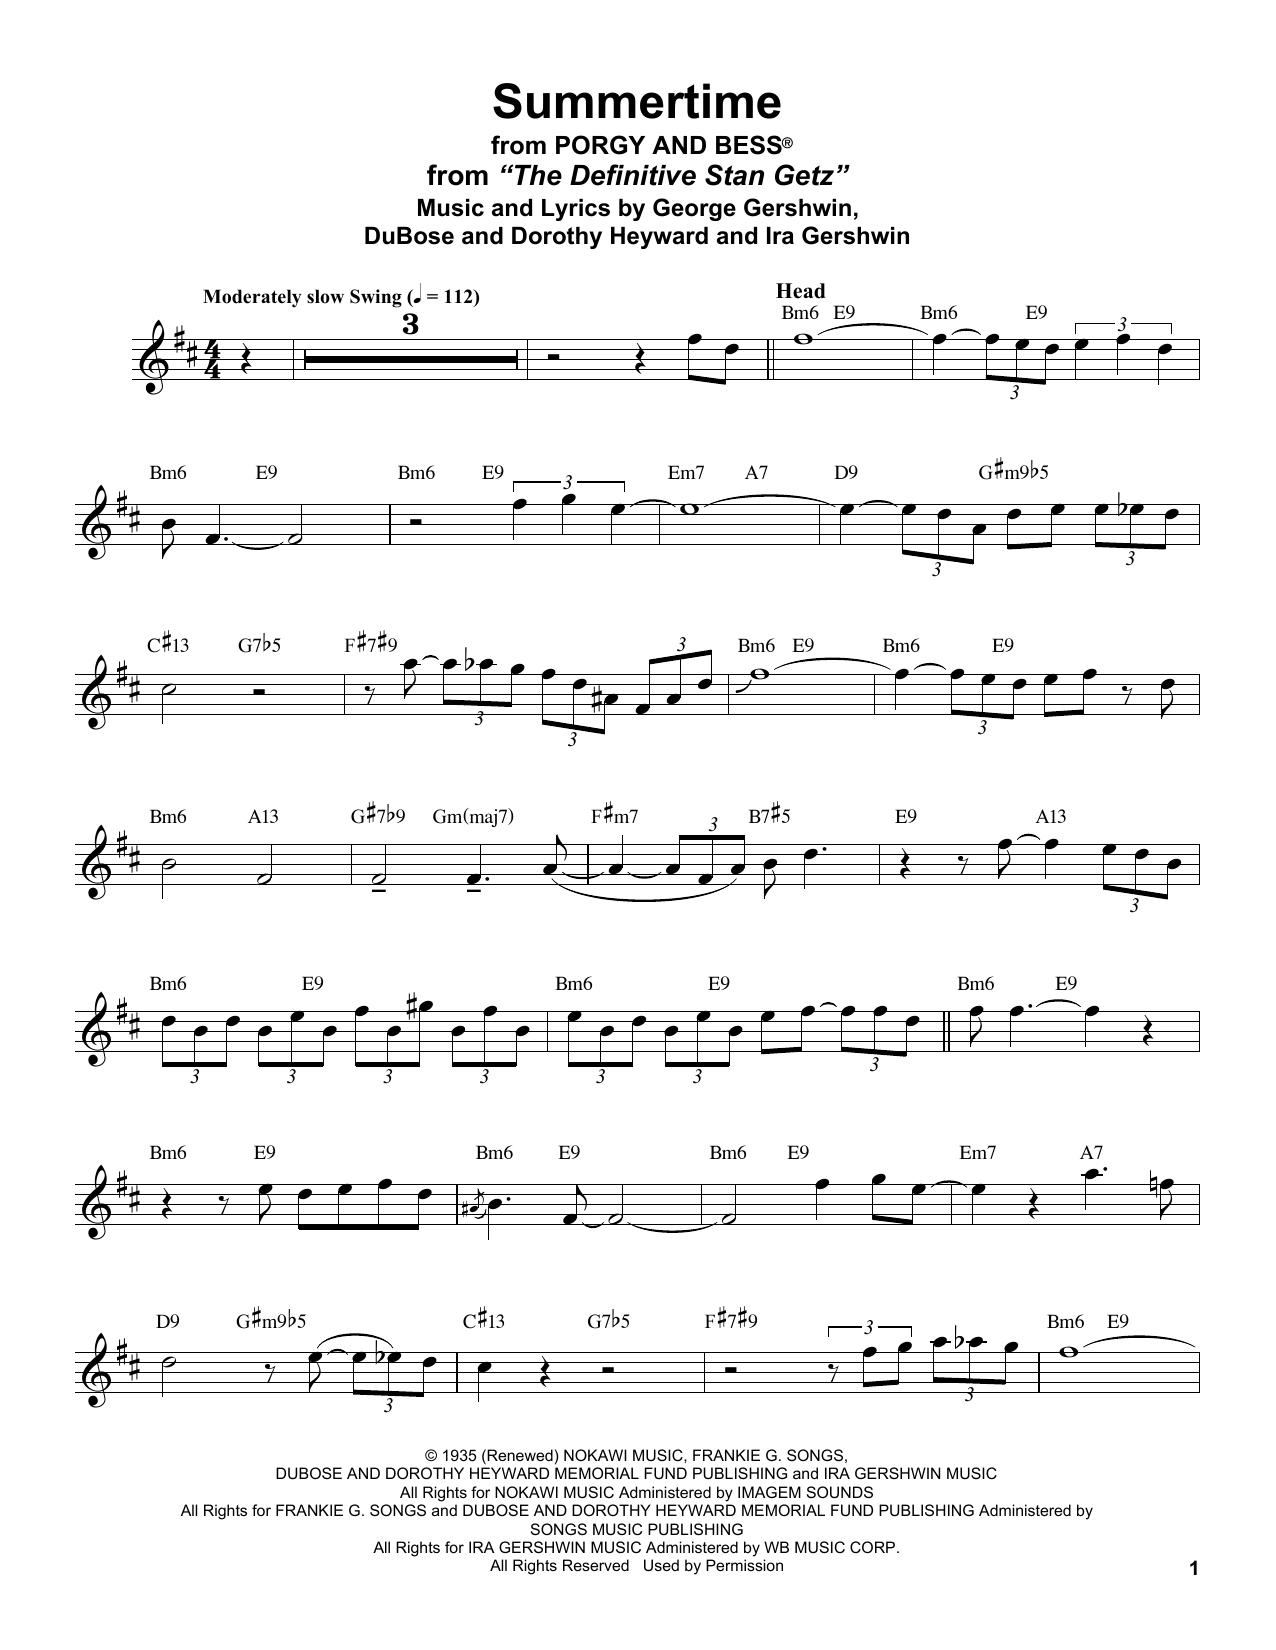 Stan Getz Summertime Sheet Music Notes, Chords   Download Printable Tenor  Sax Transcription PDF Score   SKU 15